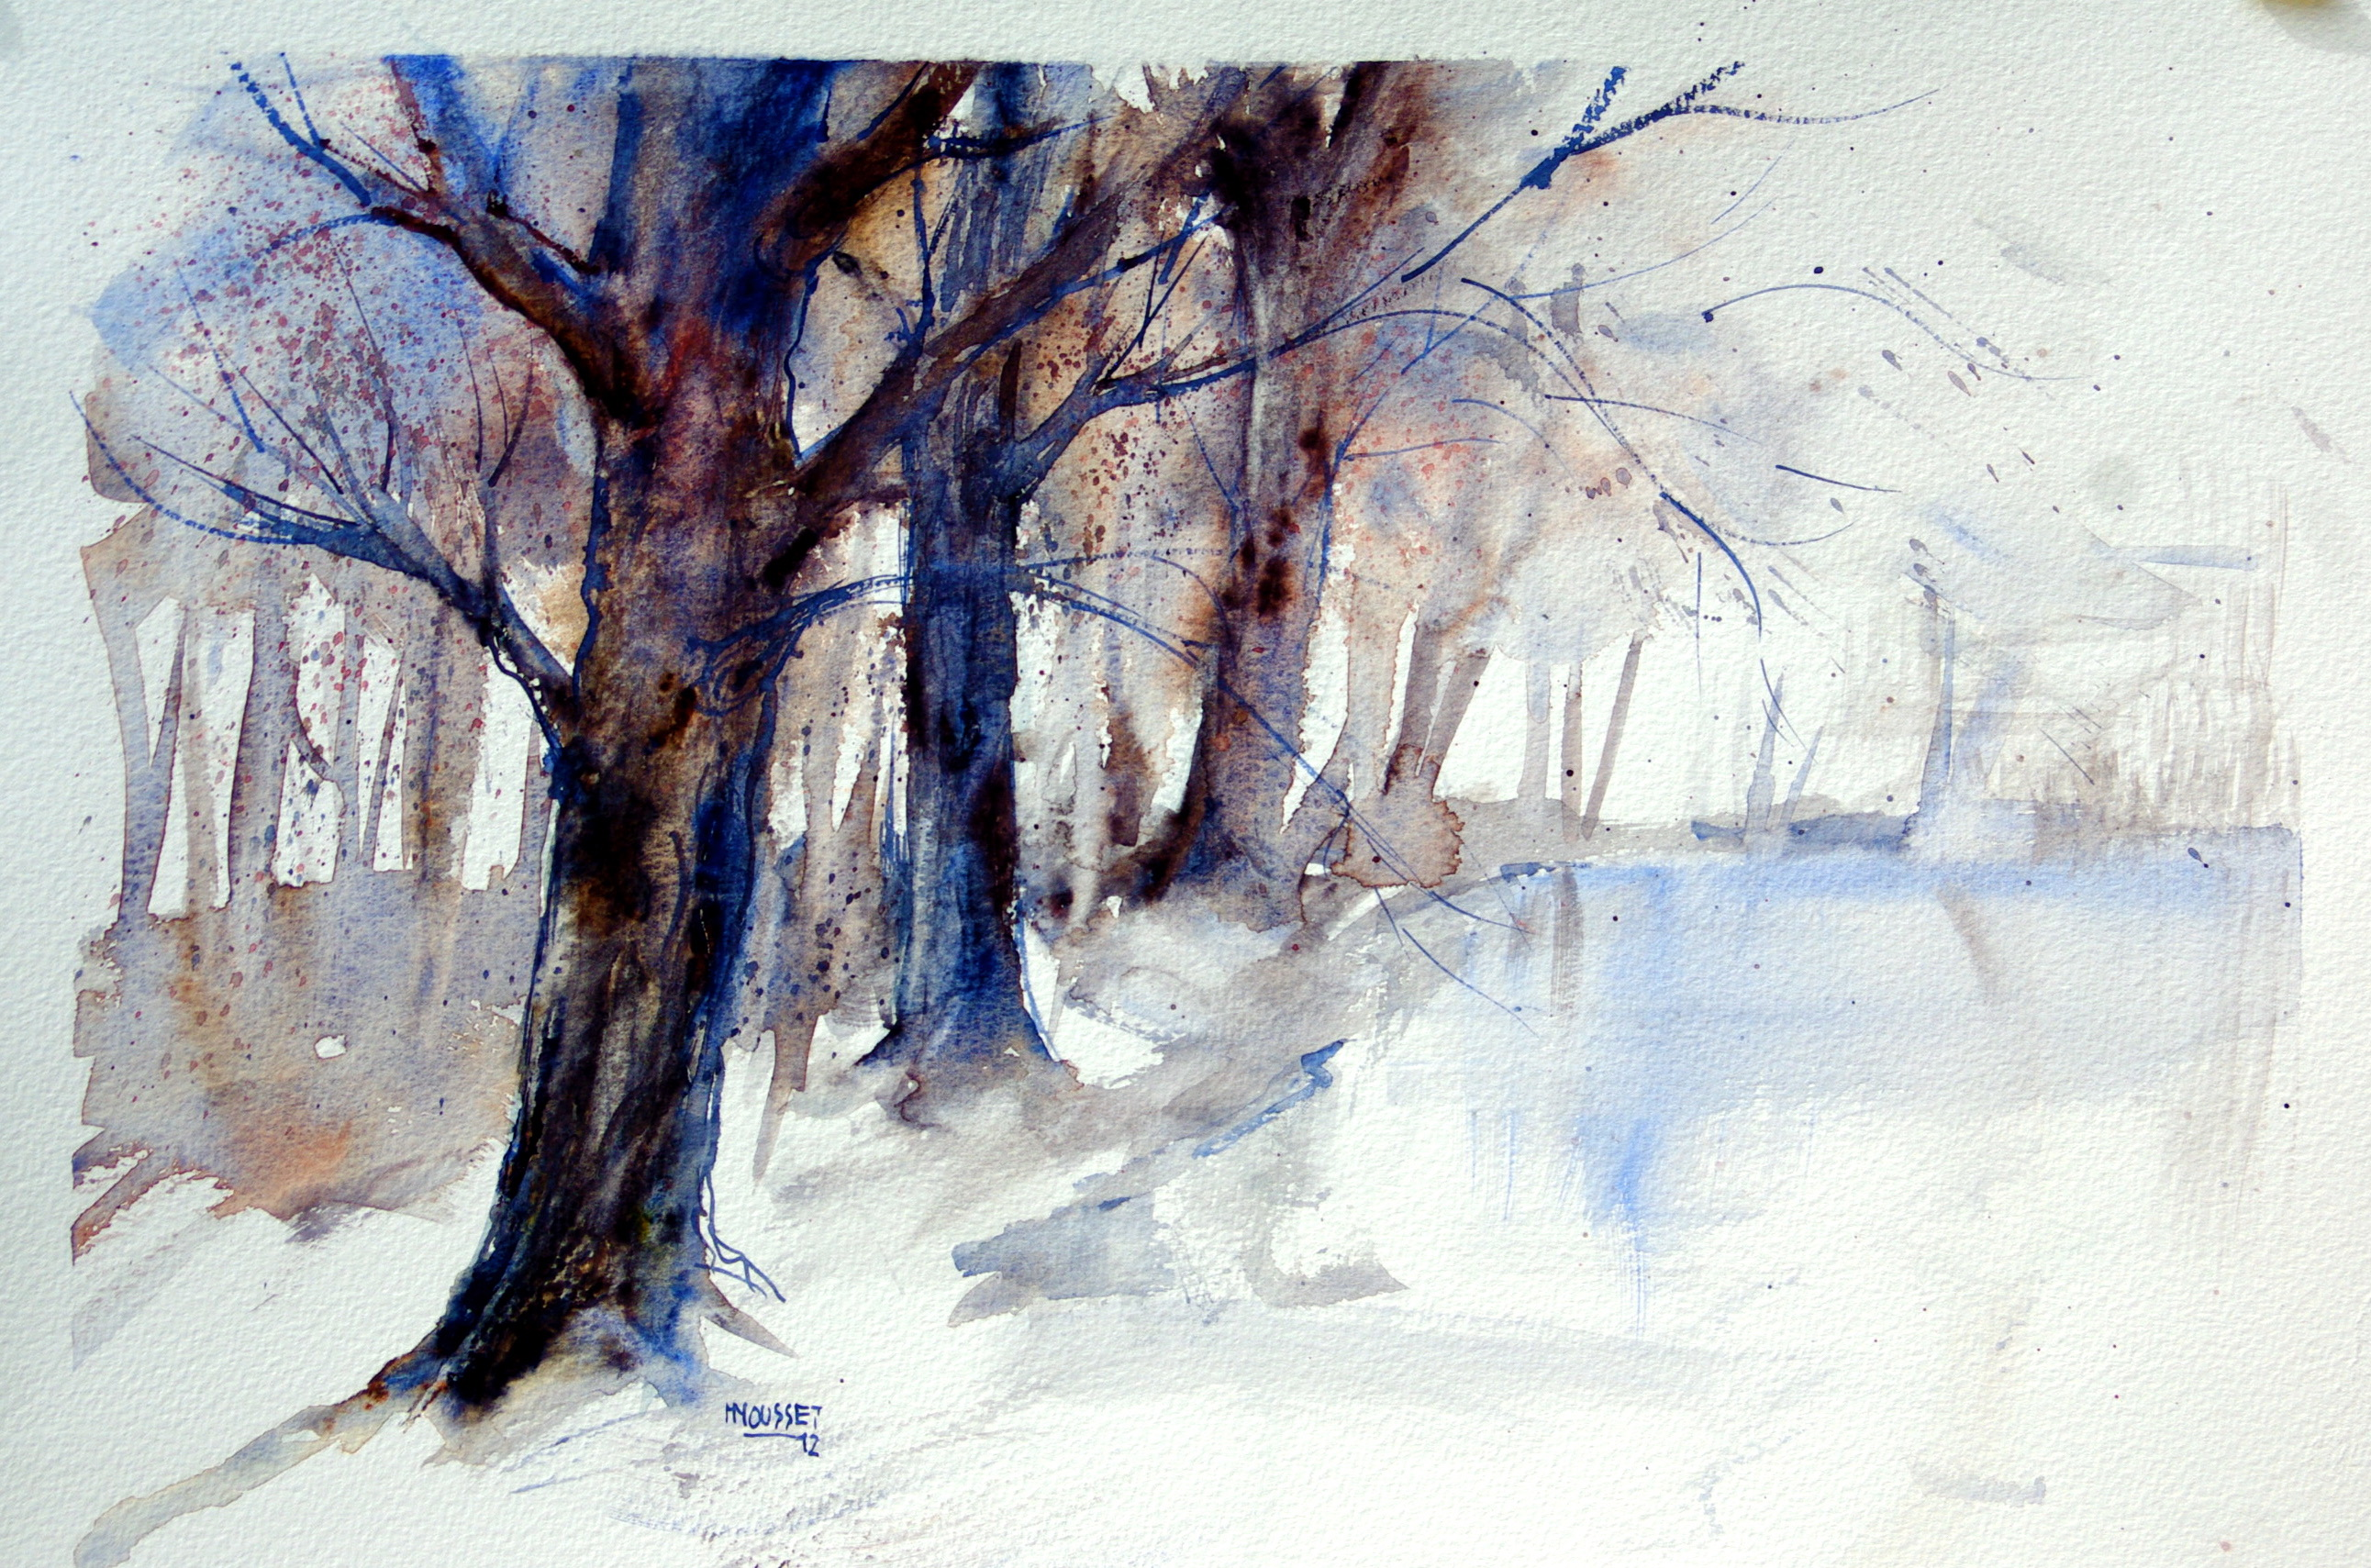 islandia:winterse bomen